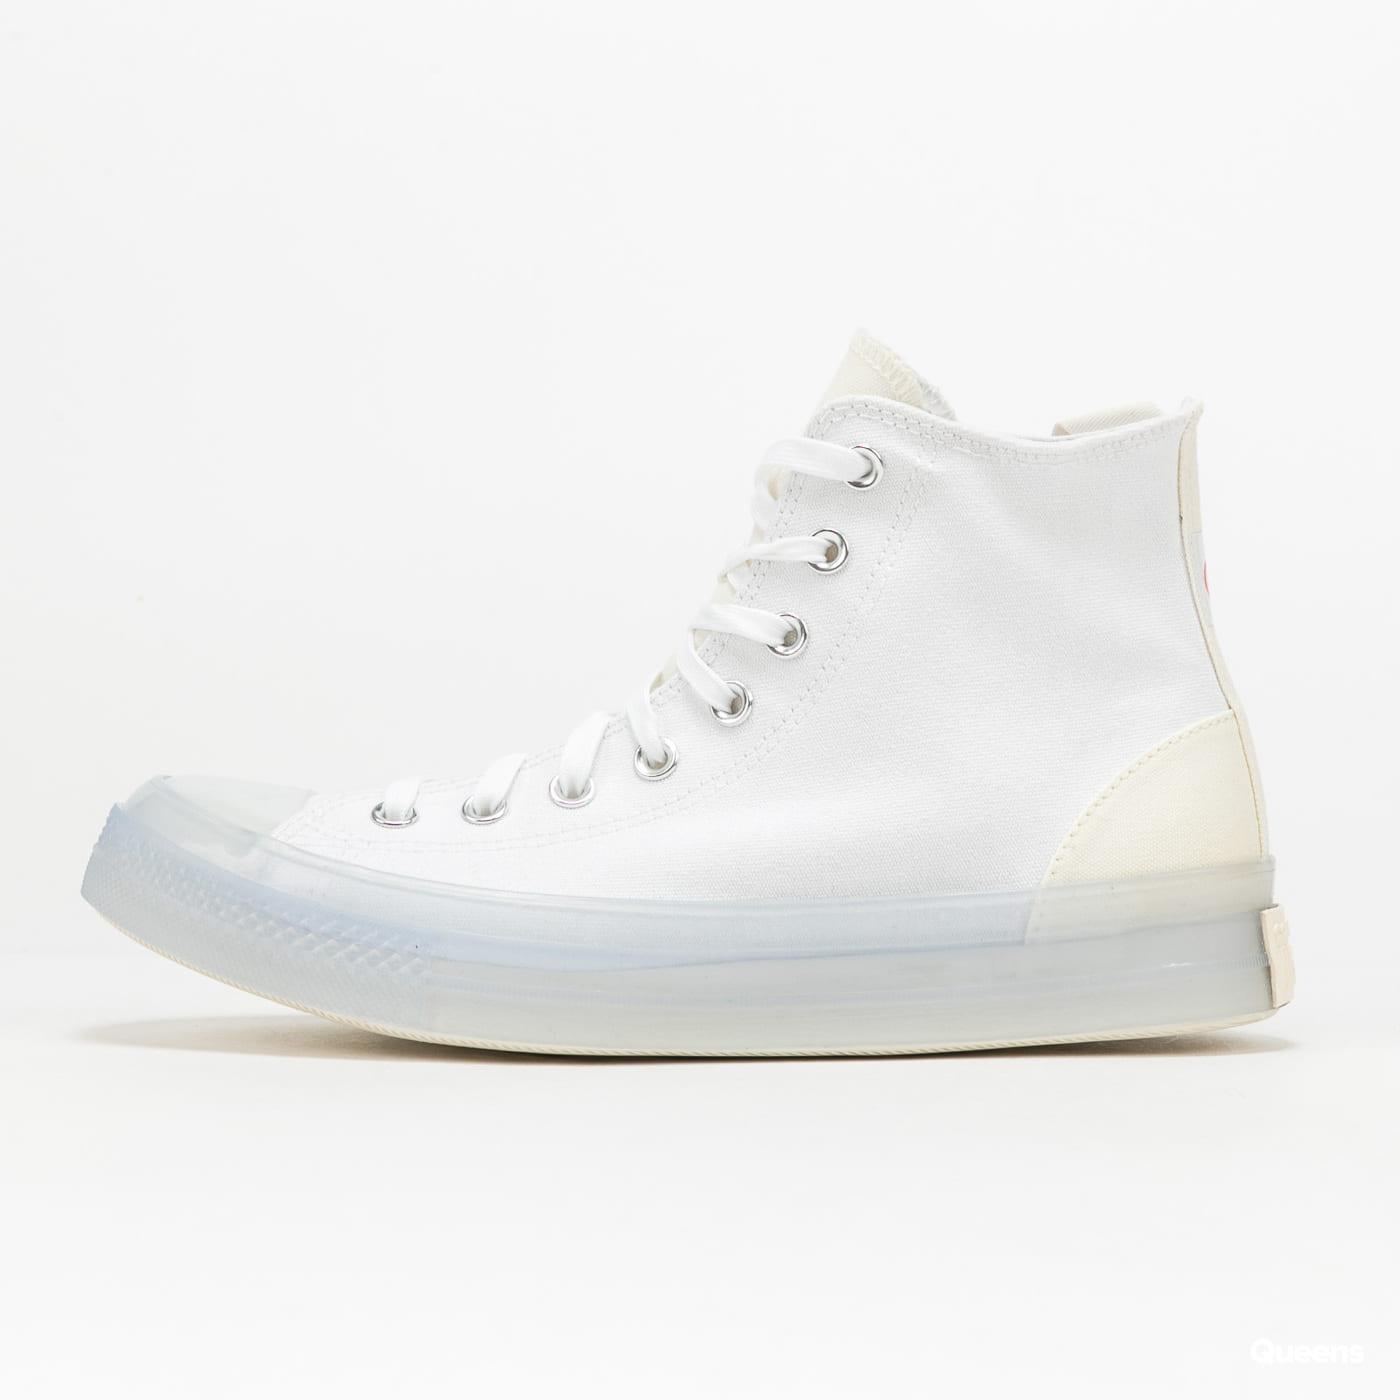 Converse Chuck Taylor All Star CX Hi white / egret / white